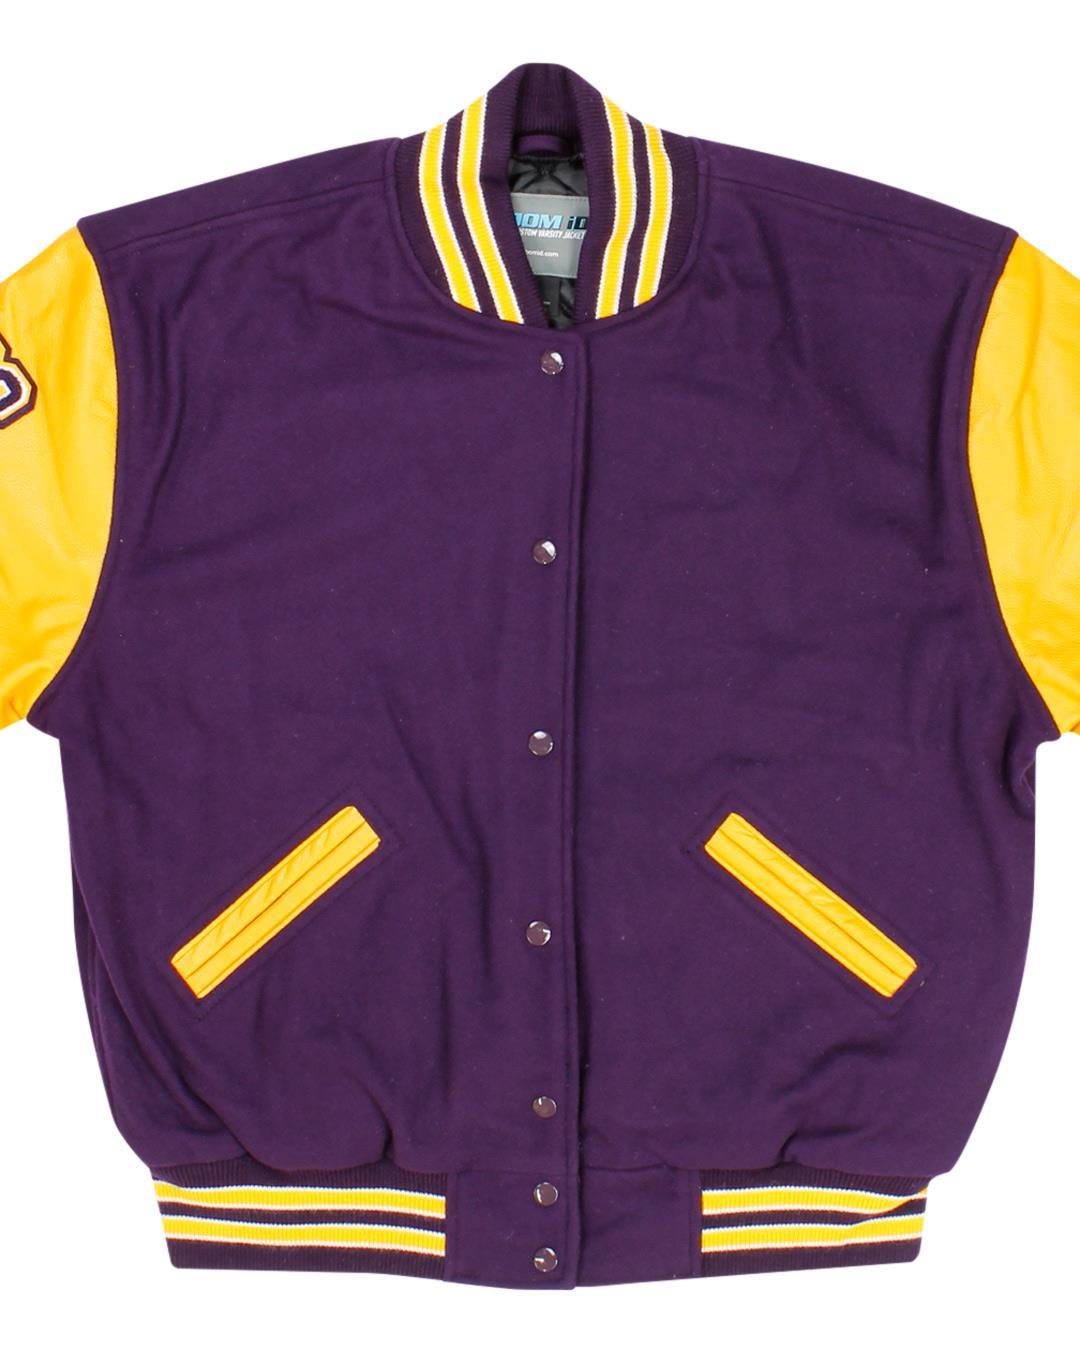 West Grand High School Varsity Jacket, Kremmling CO